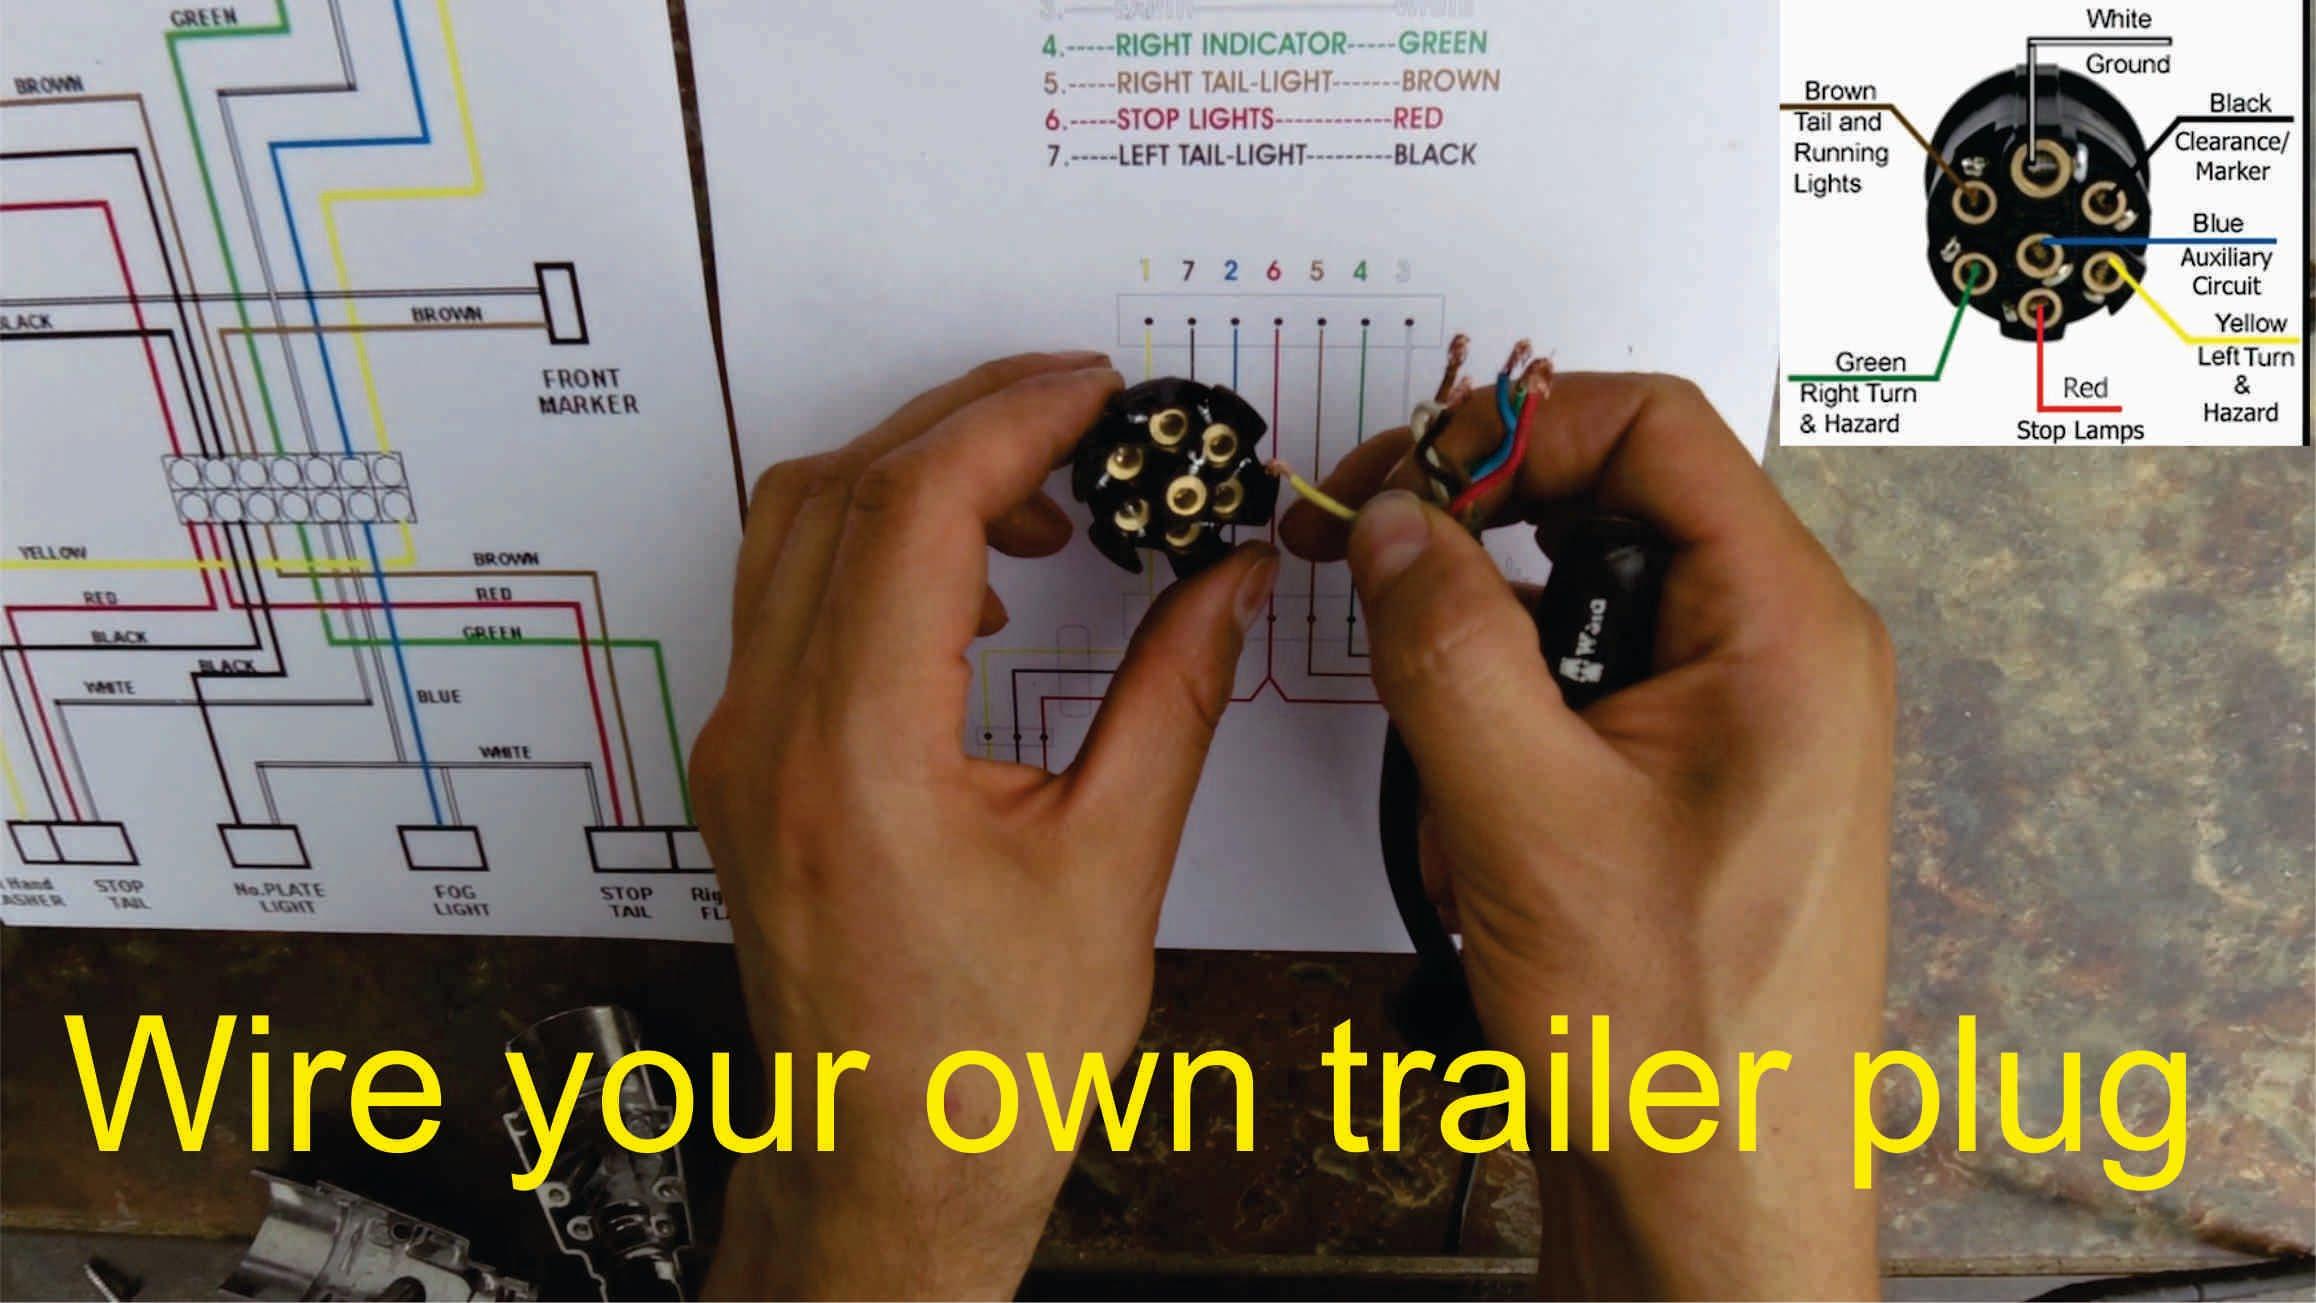 4 Pin To 7 Pin Trailer Adapter Wiring Diagram | Wirings Diagram  Pin Auxiliary Wiring Diagram on s-video pin diagram, 4 pin cable, 4 pin fan diagram, 4 pin socket diagram, 4 pin relay, 4 pin switch, 4 pin fuse, 4 pin round trailer wiring, 4 pin sensor diagram, 4 pin voltage, 4 pin connector, 4 pin trailer diagram, 4 pin trailer harness, 110cc wire harness diagram, 4 pin harness diagram, and 4 pin input diagram, vga pinout diagram, 4 pin wire harness, 4 pin plug, 4 pin wiring chart,